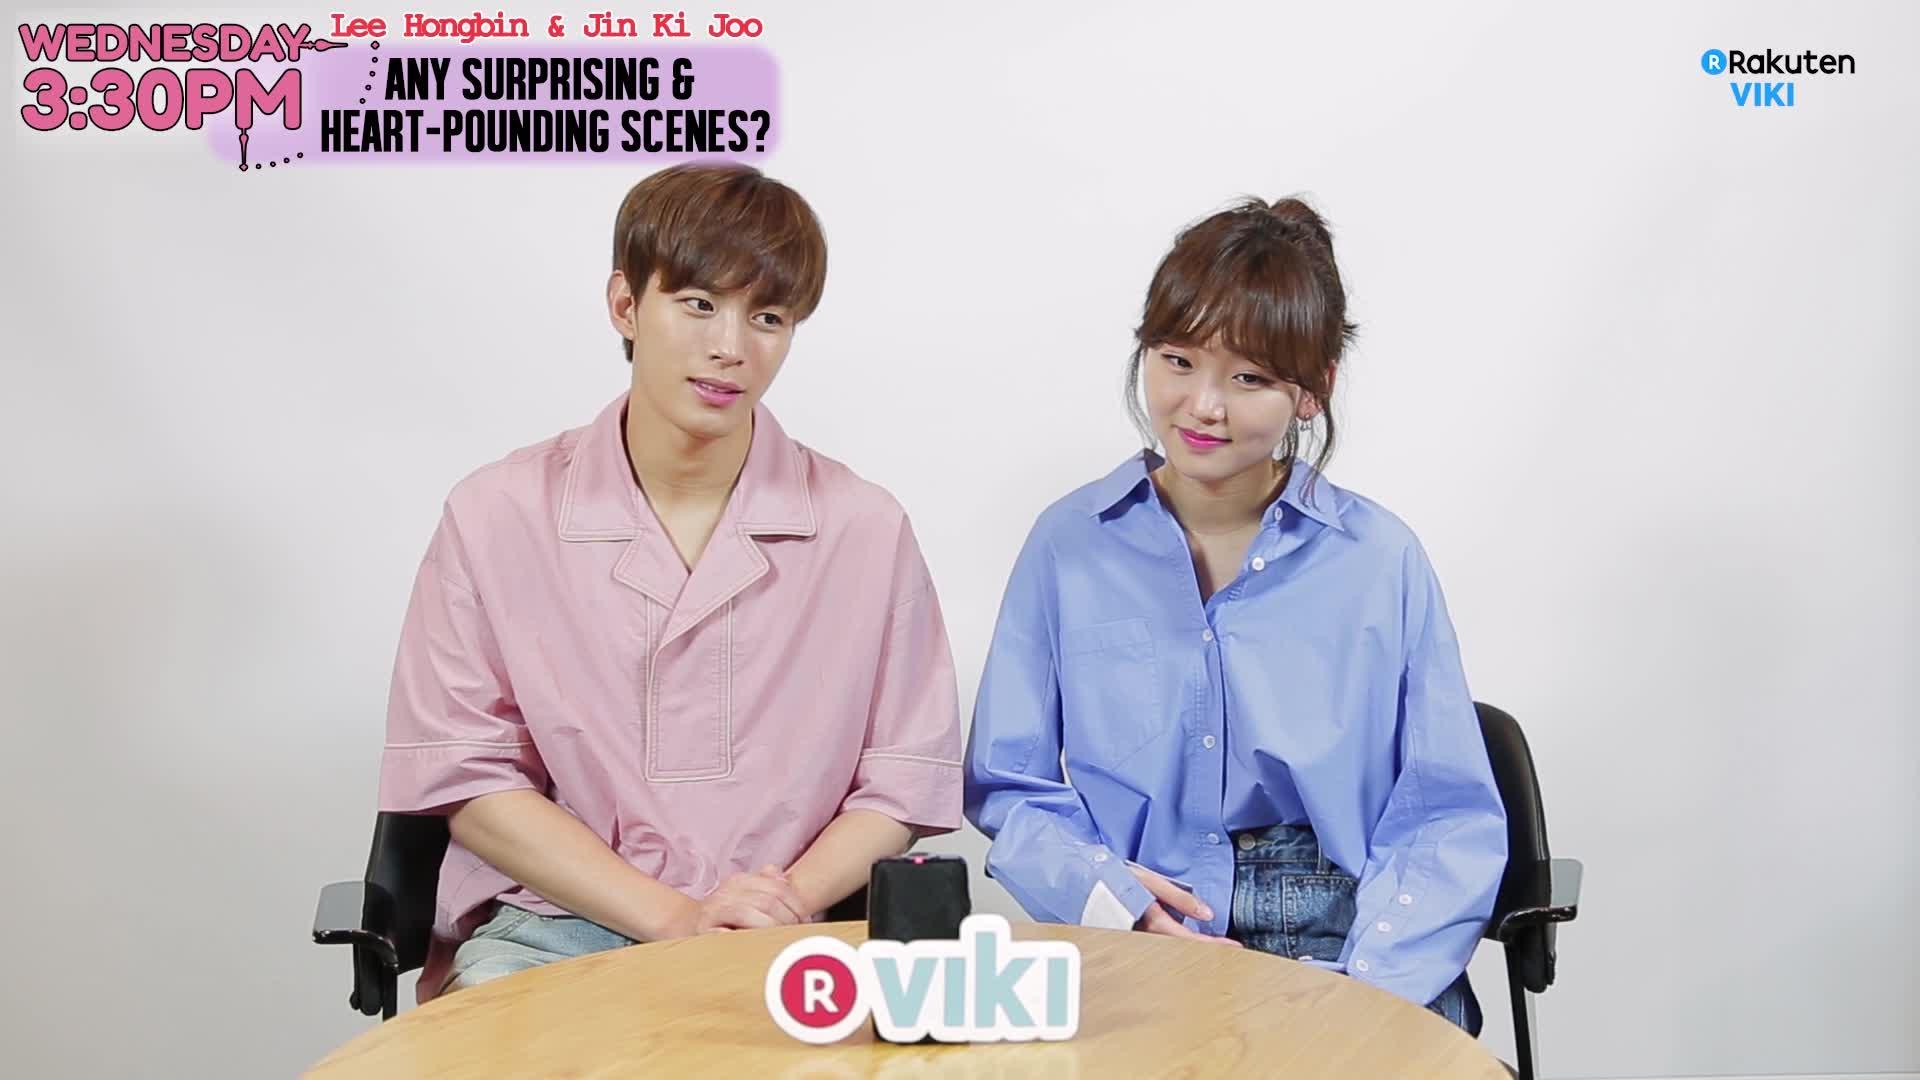 Exclusive Interview: Hongbin and Ki Joo's Aegyo Battle: Wednesday 3:30 PM